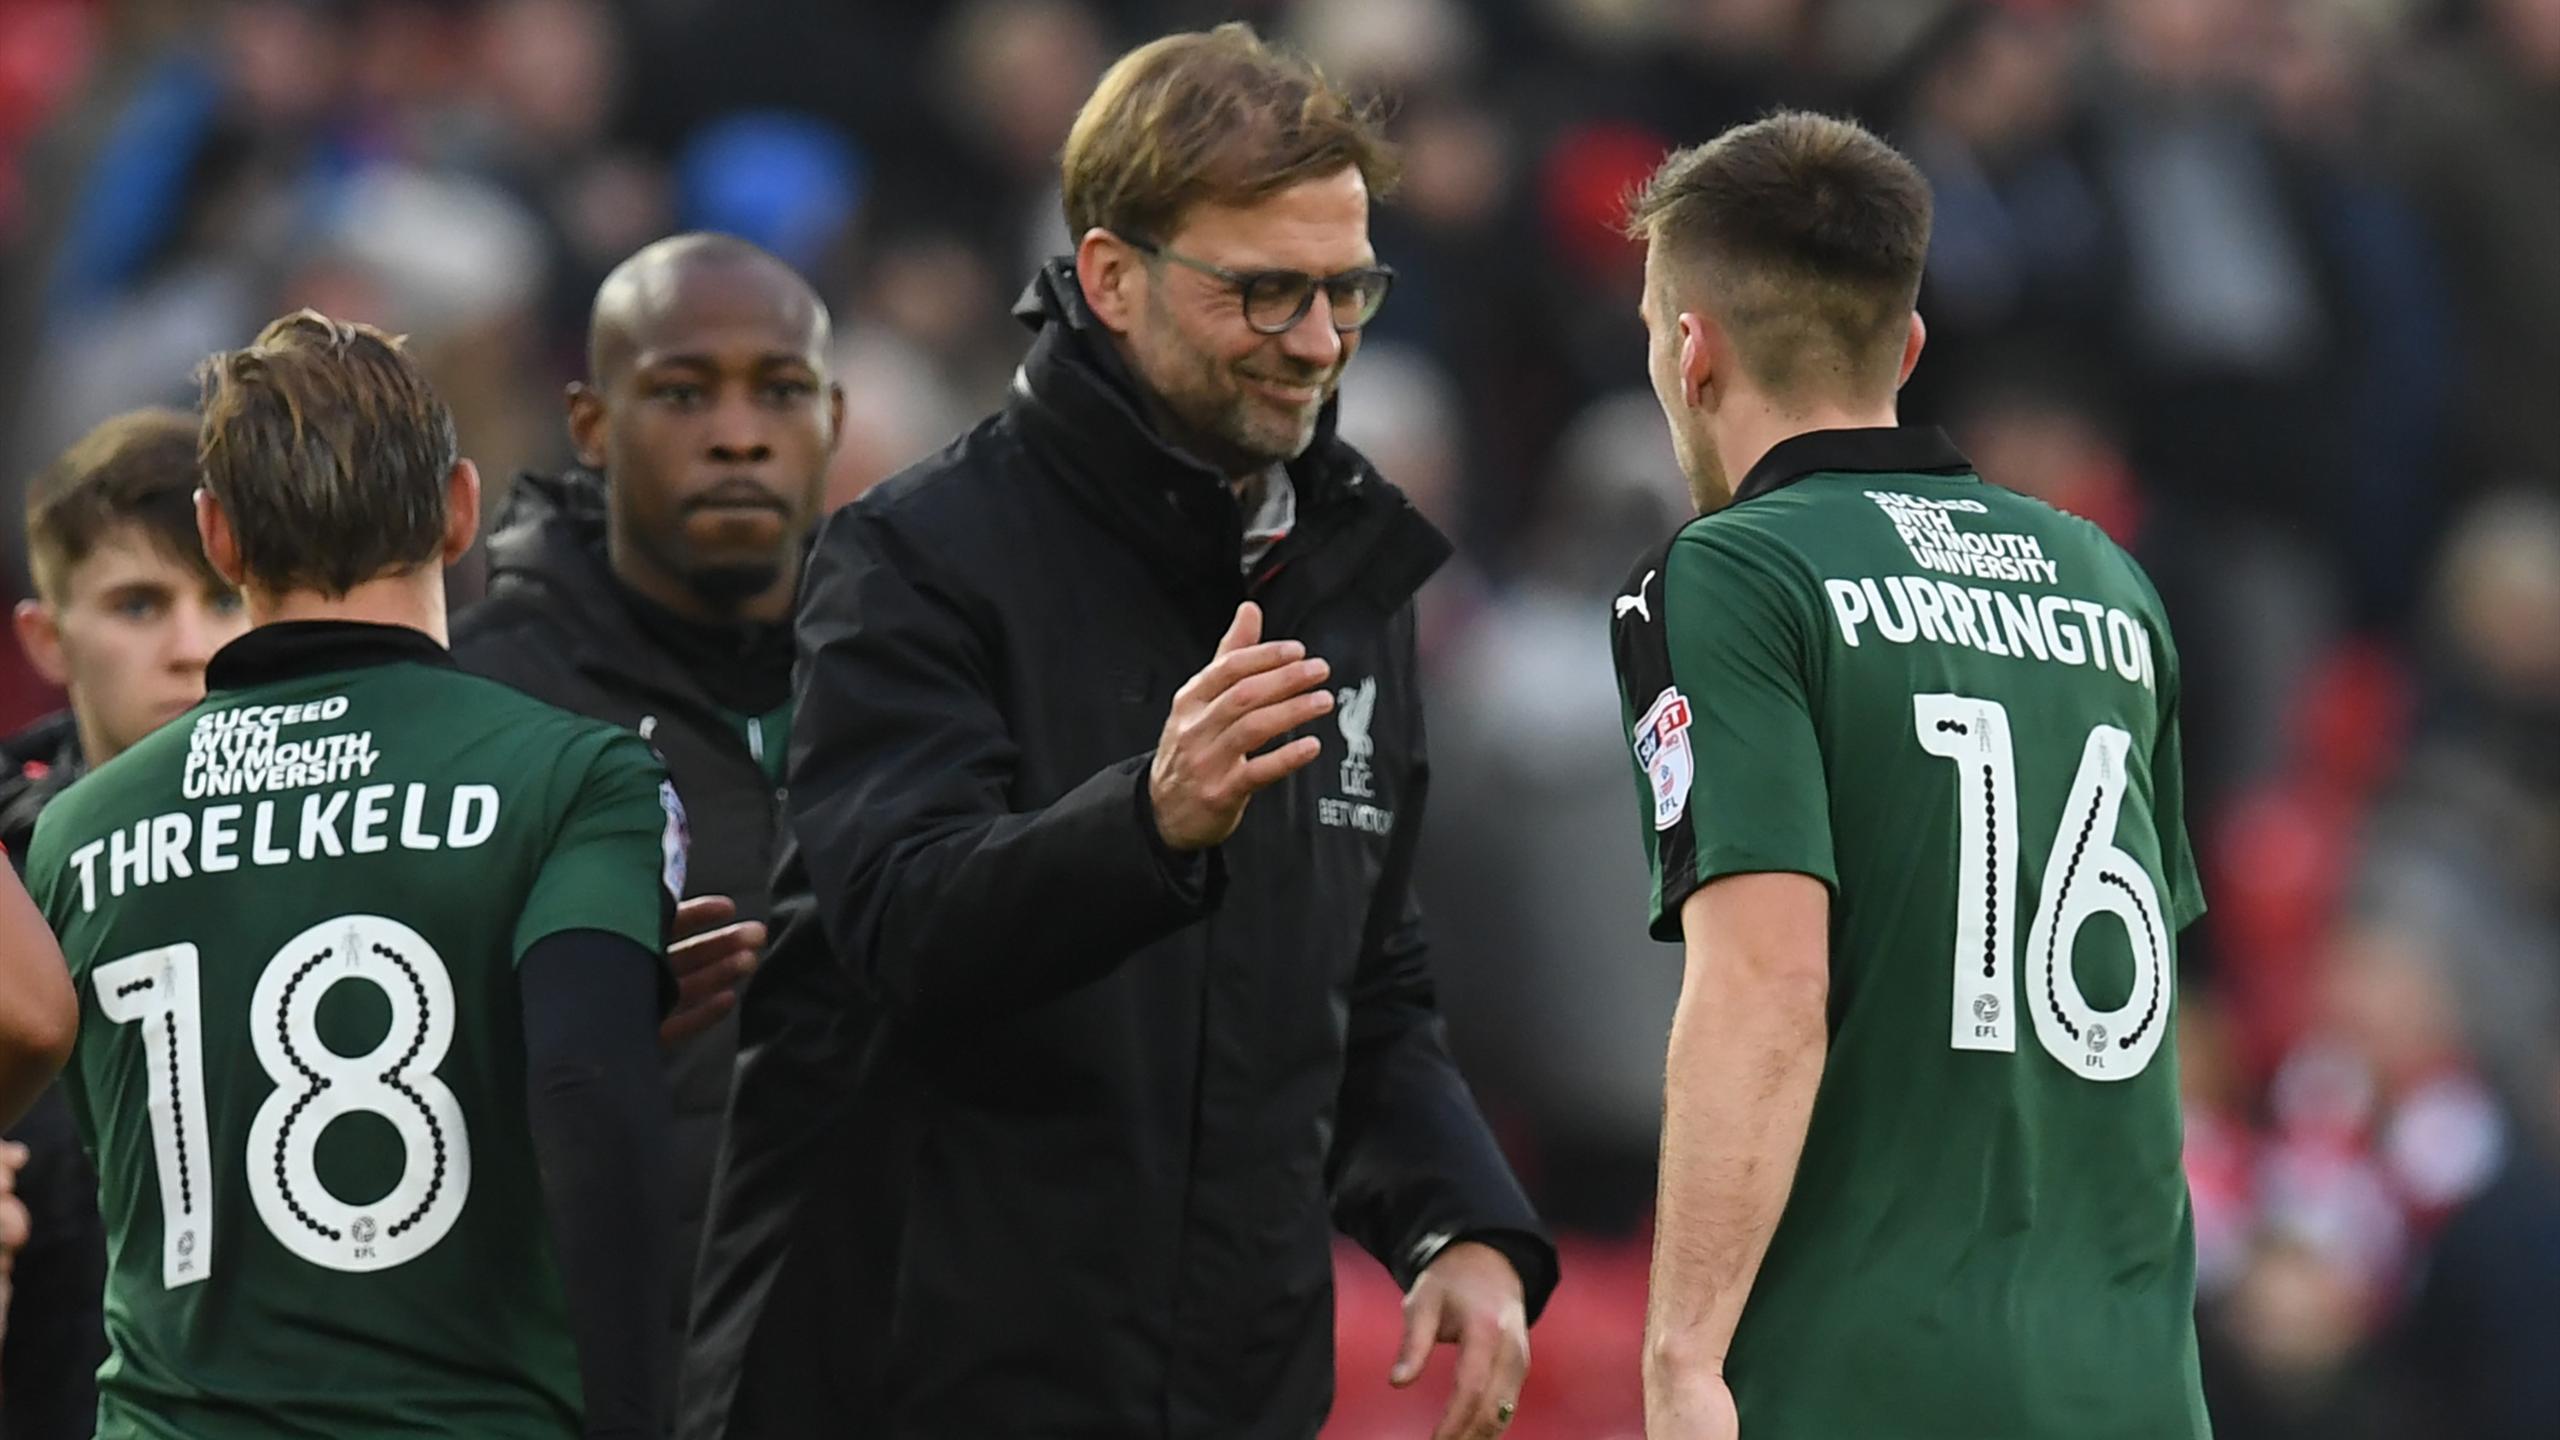 Liverpool's German manager Jurgen Klopp (C) congratulates Plymouth's English defender Ben Purrington